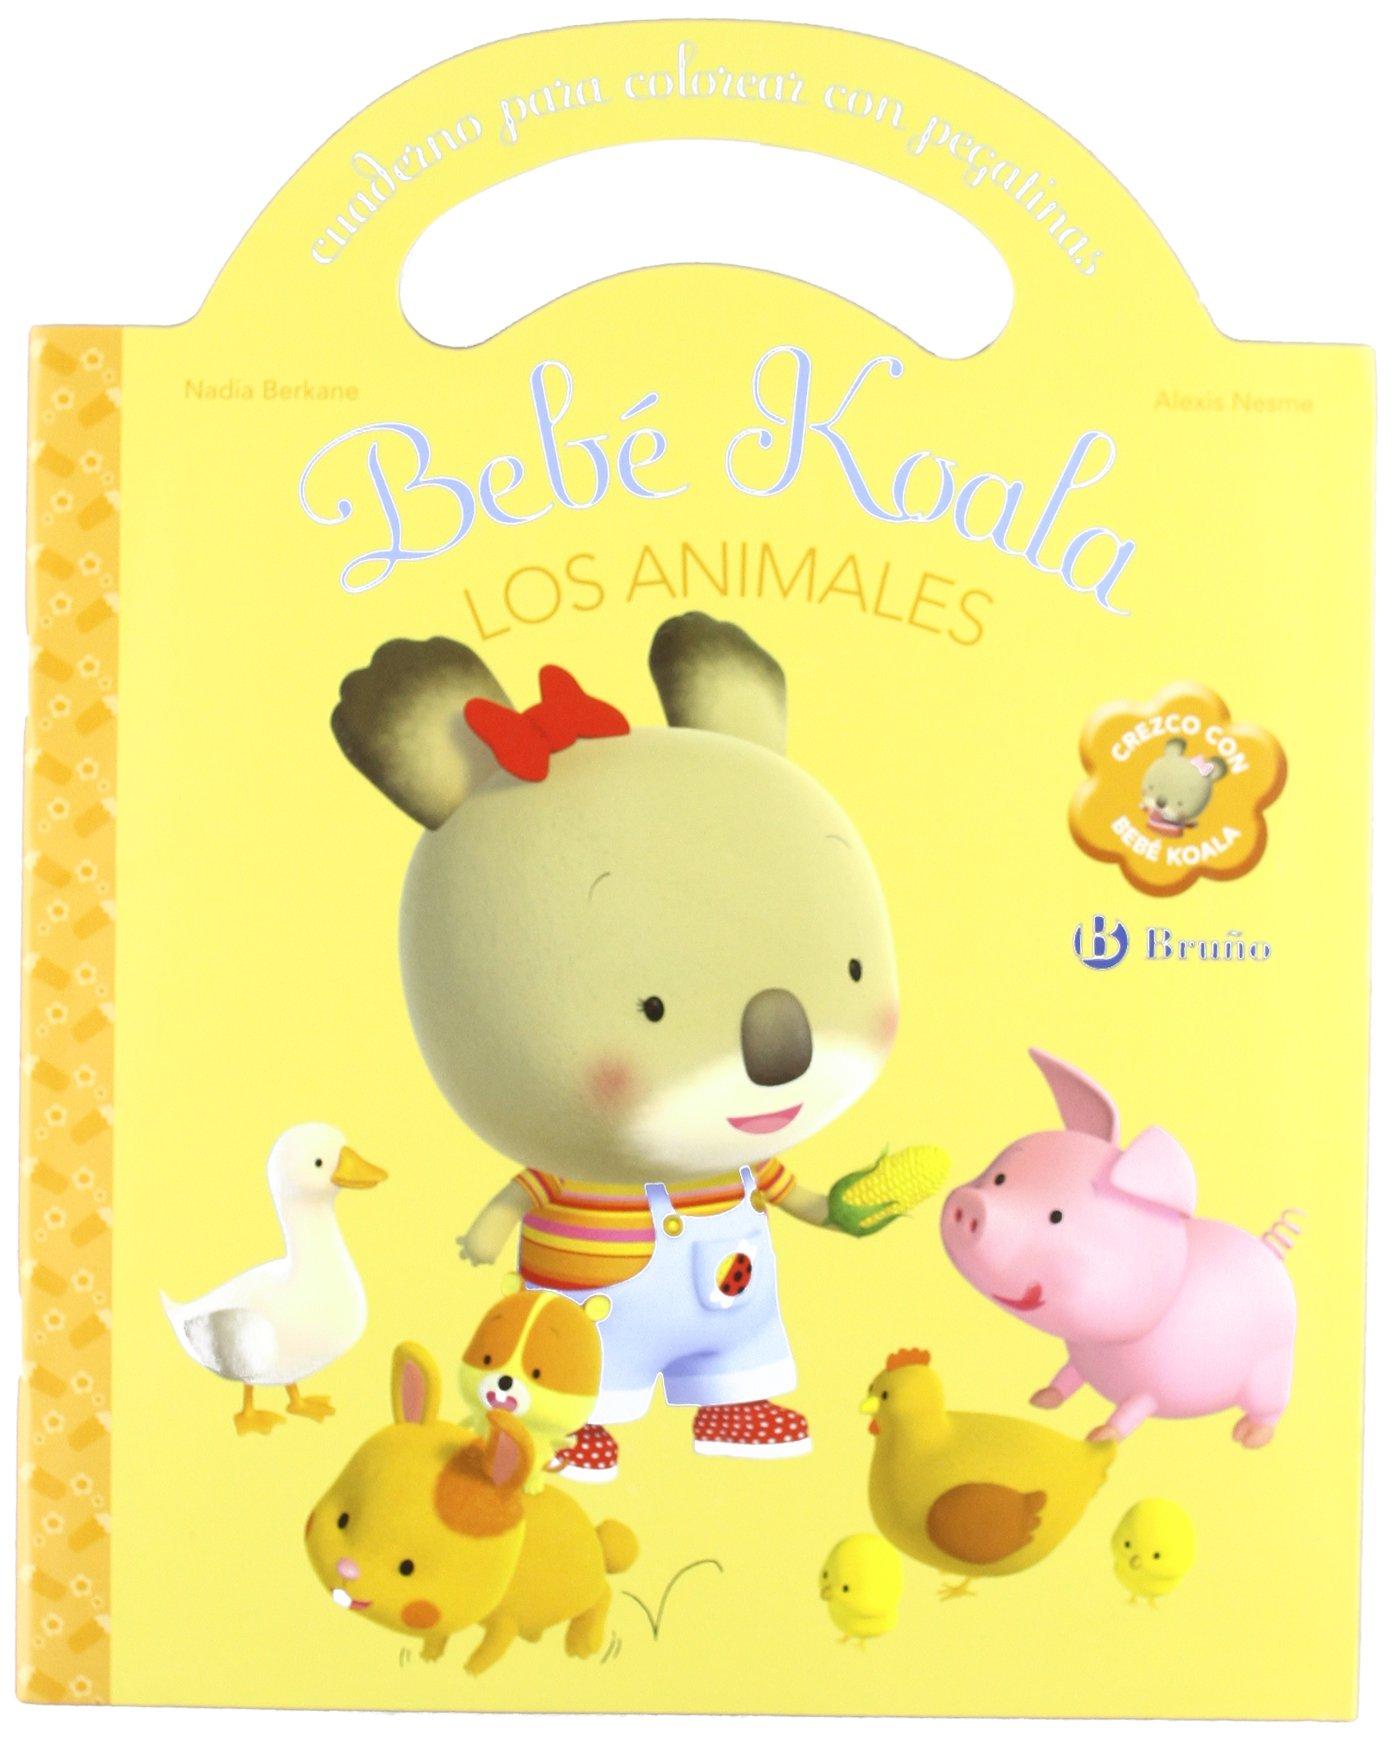 Download Los animales / The Animals (Bebe Koala / Baby Koala) (Spanish Edition) pdf epub